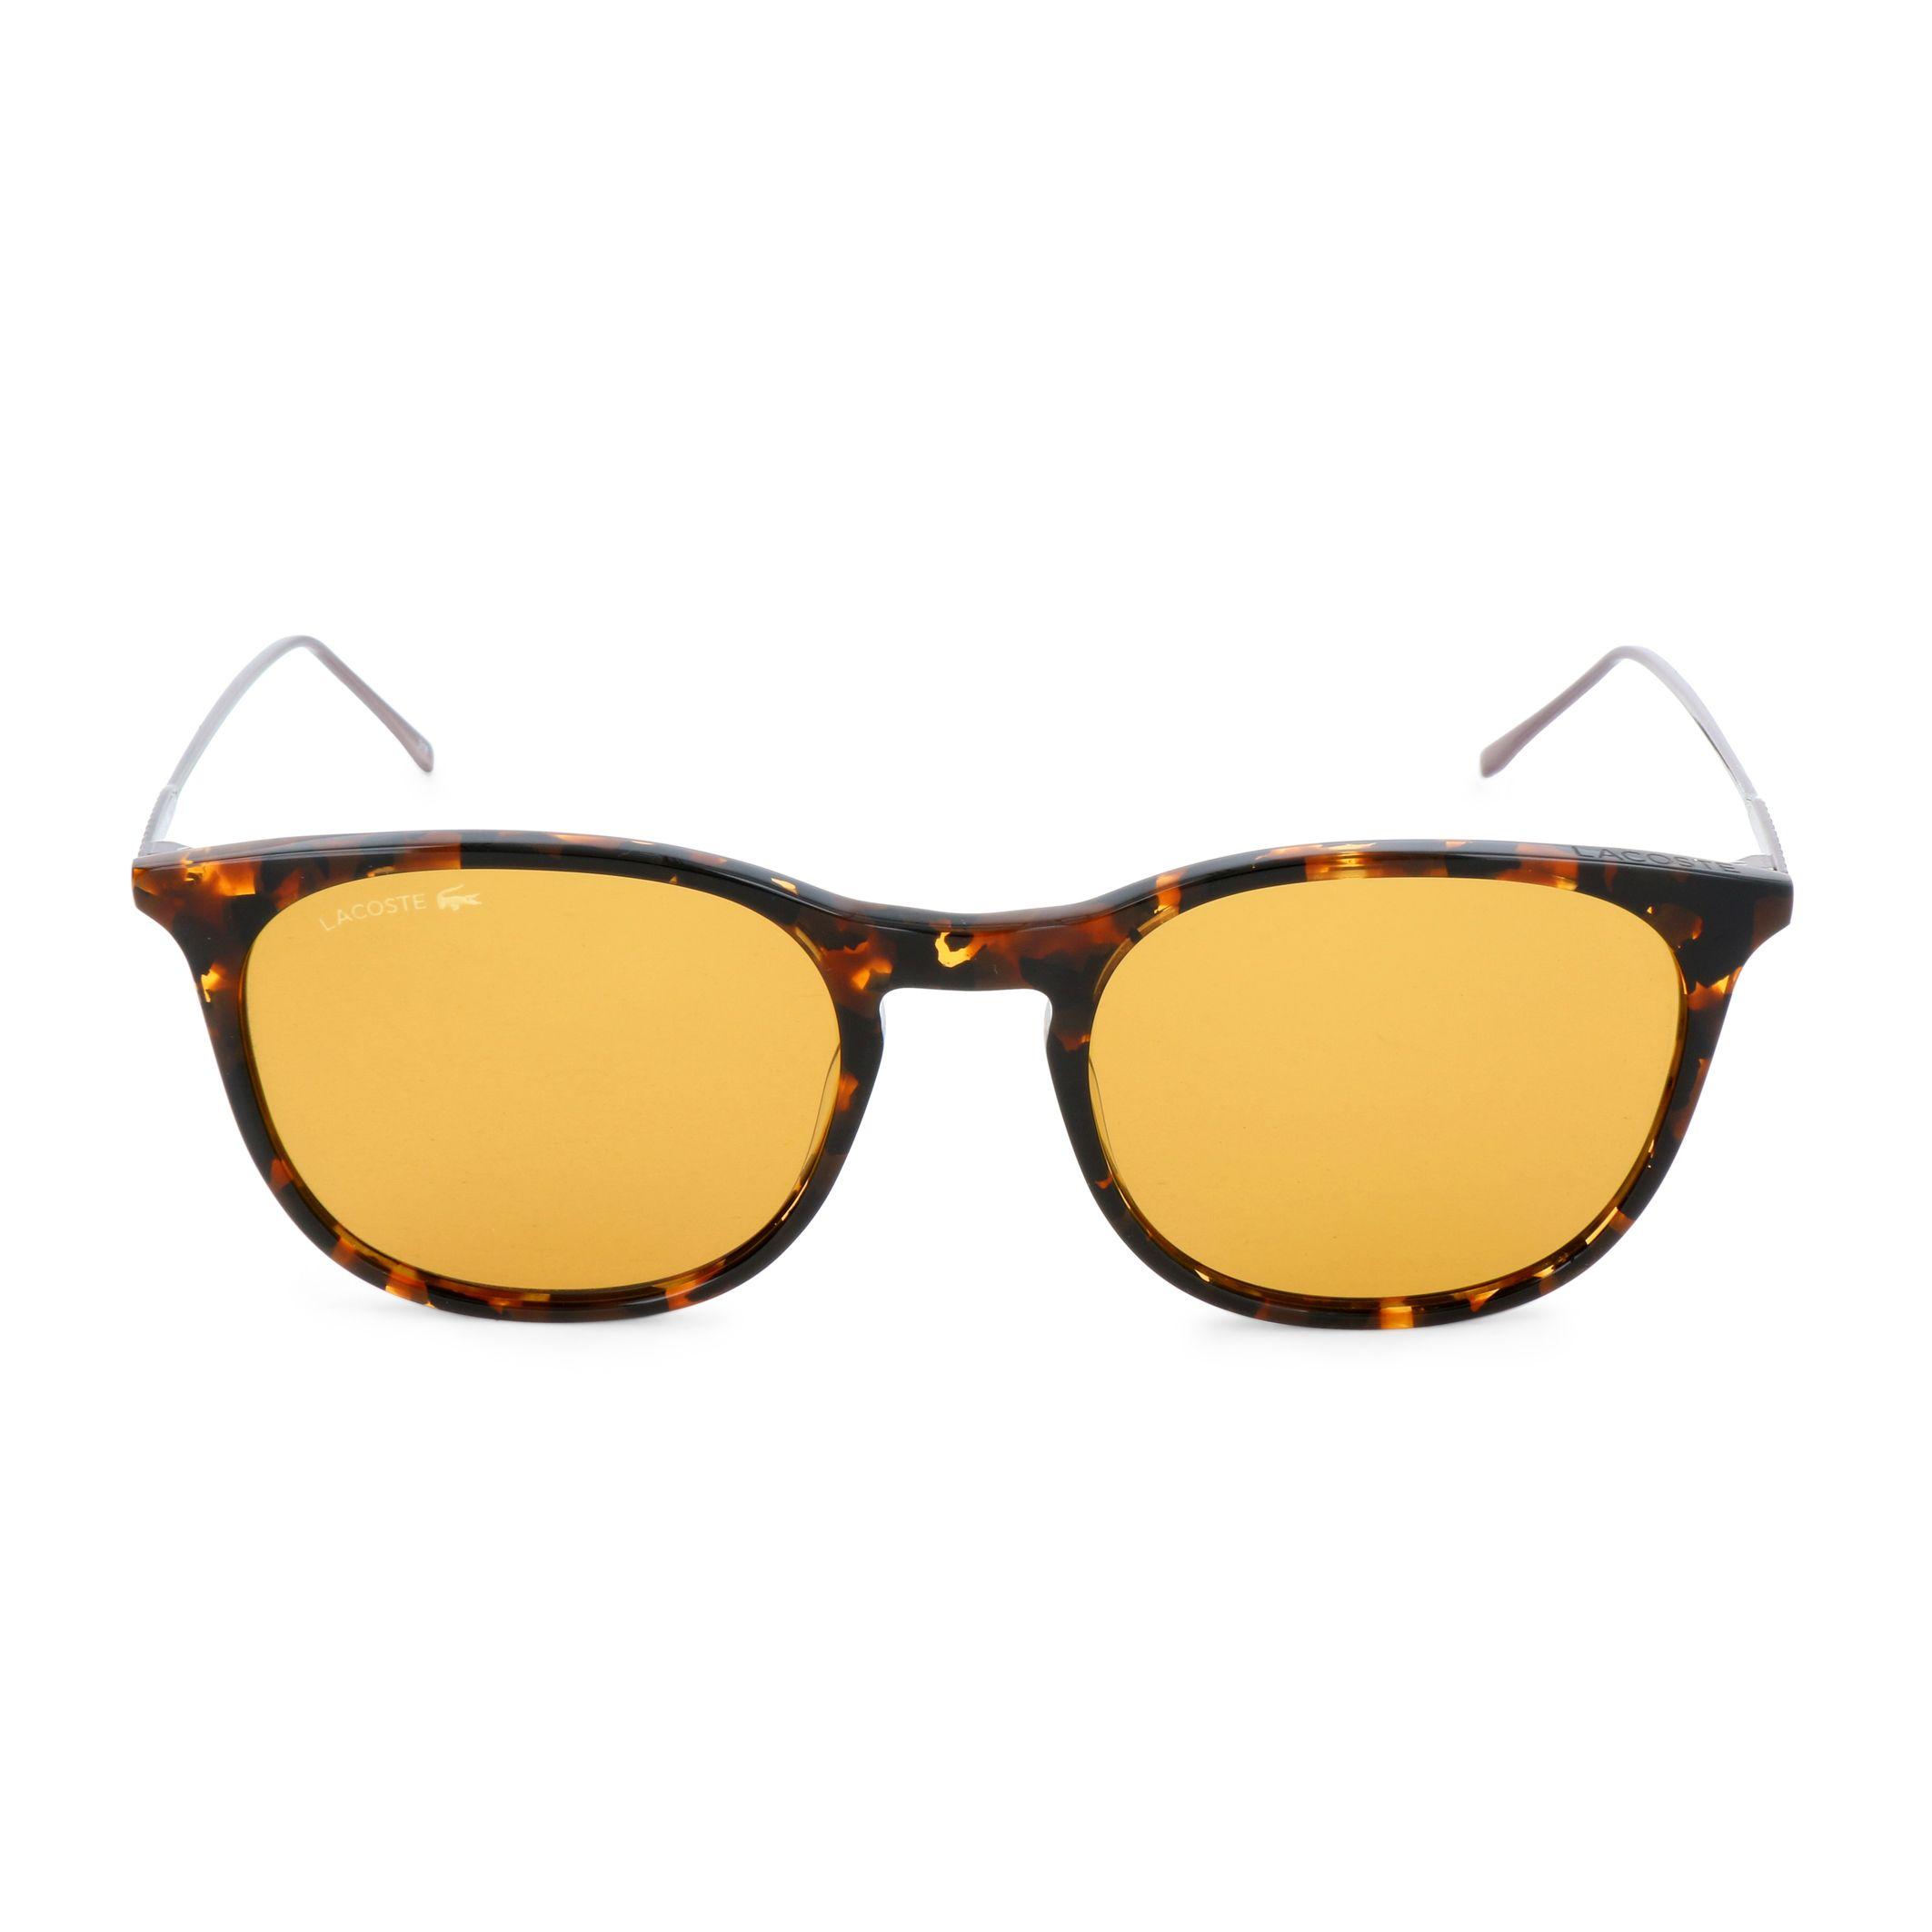 Lacoste Unisexs Sunglasses